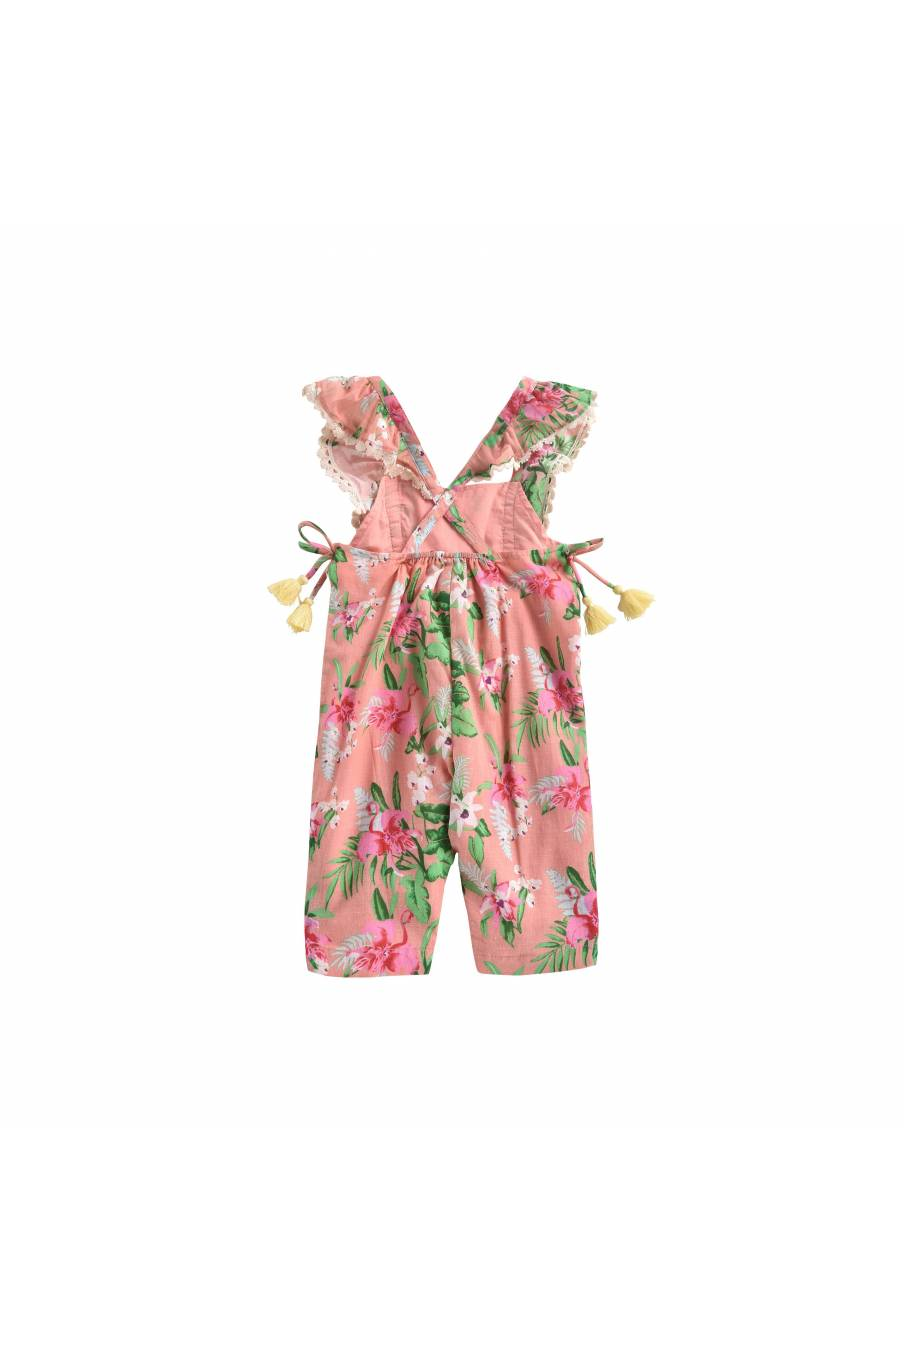 Overalls Talia Sienna Flamingo